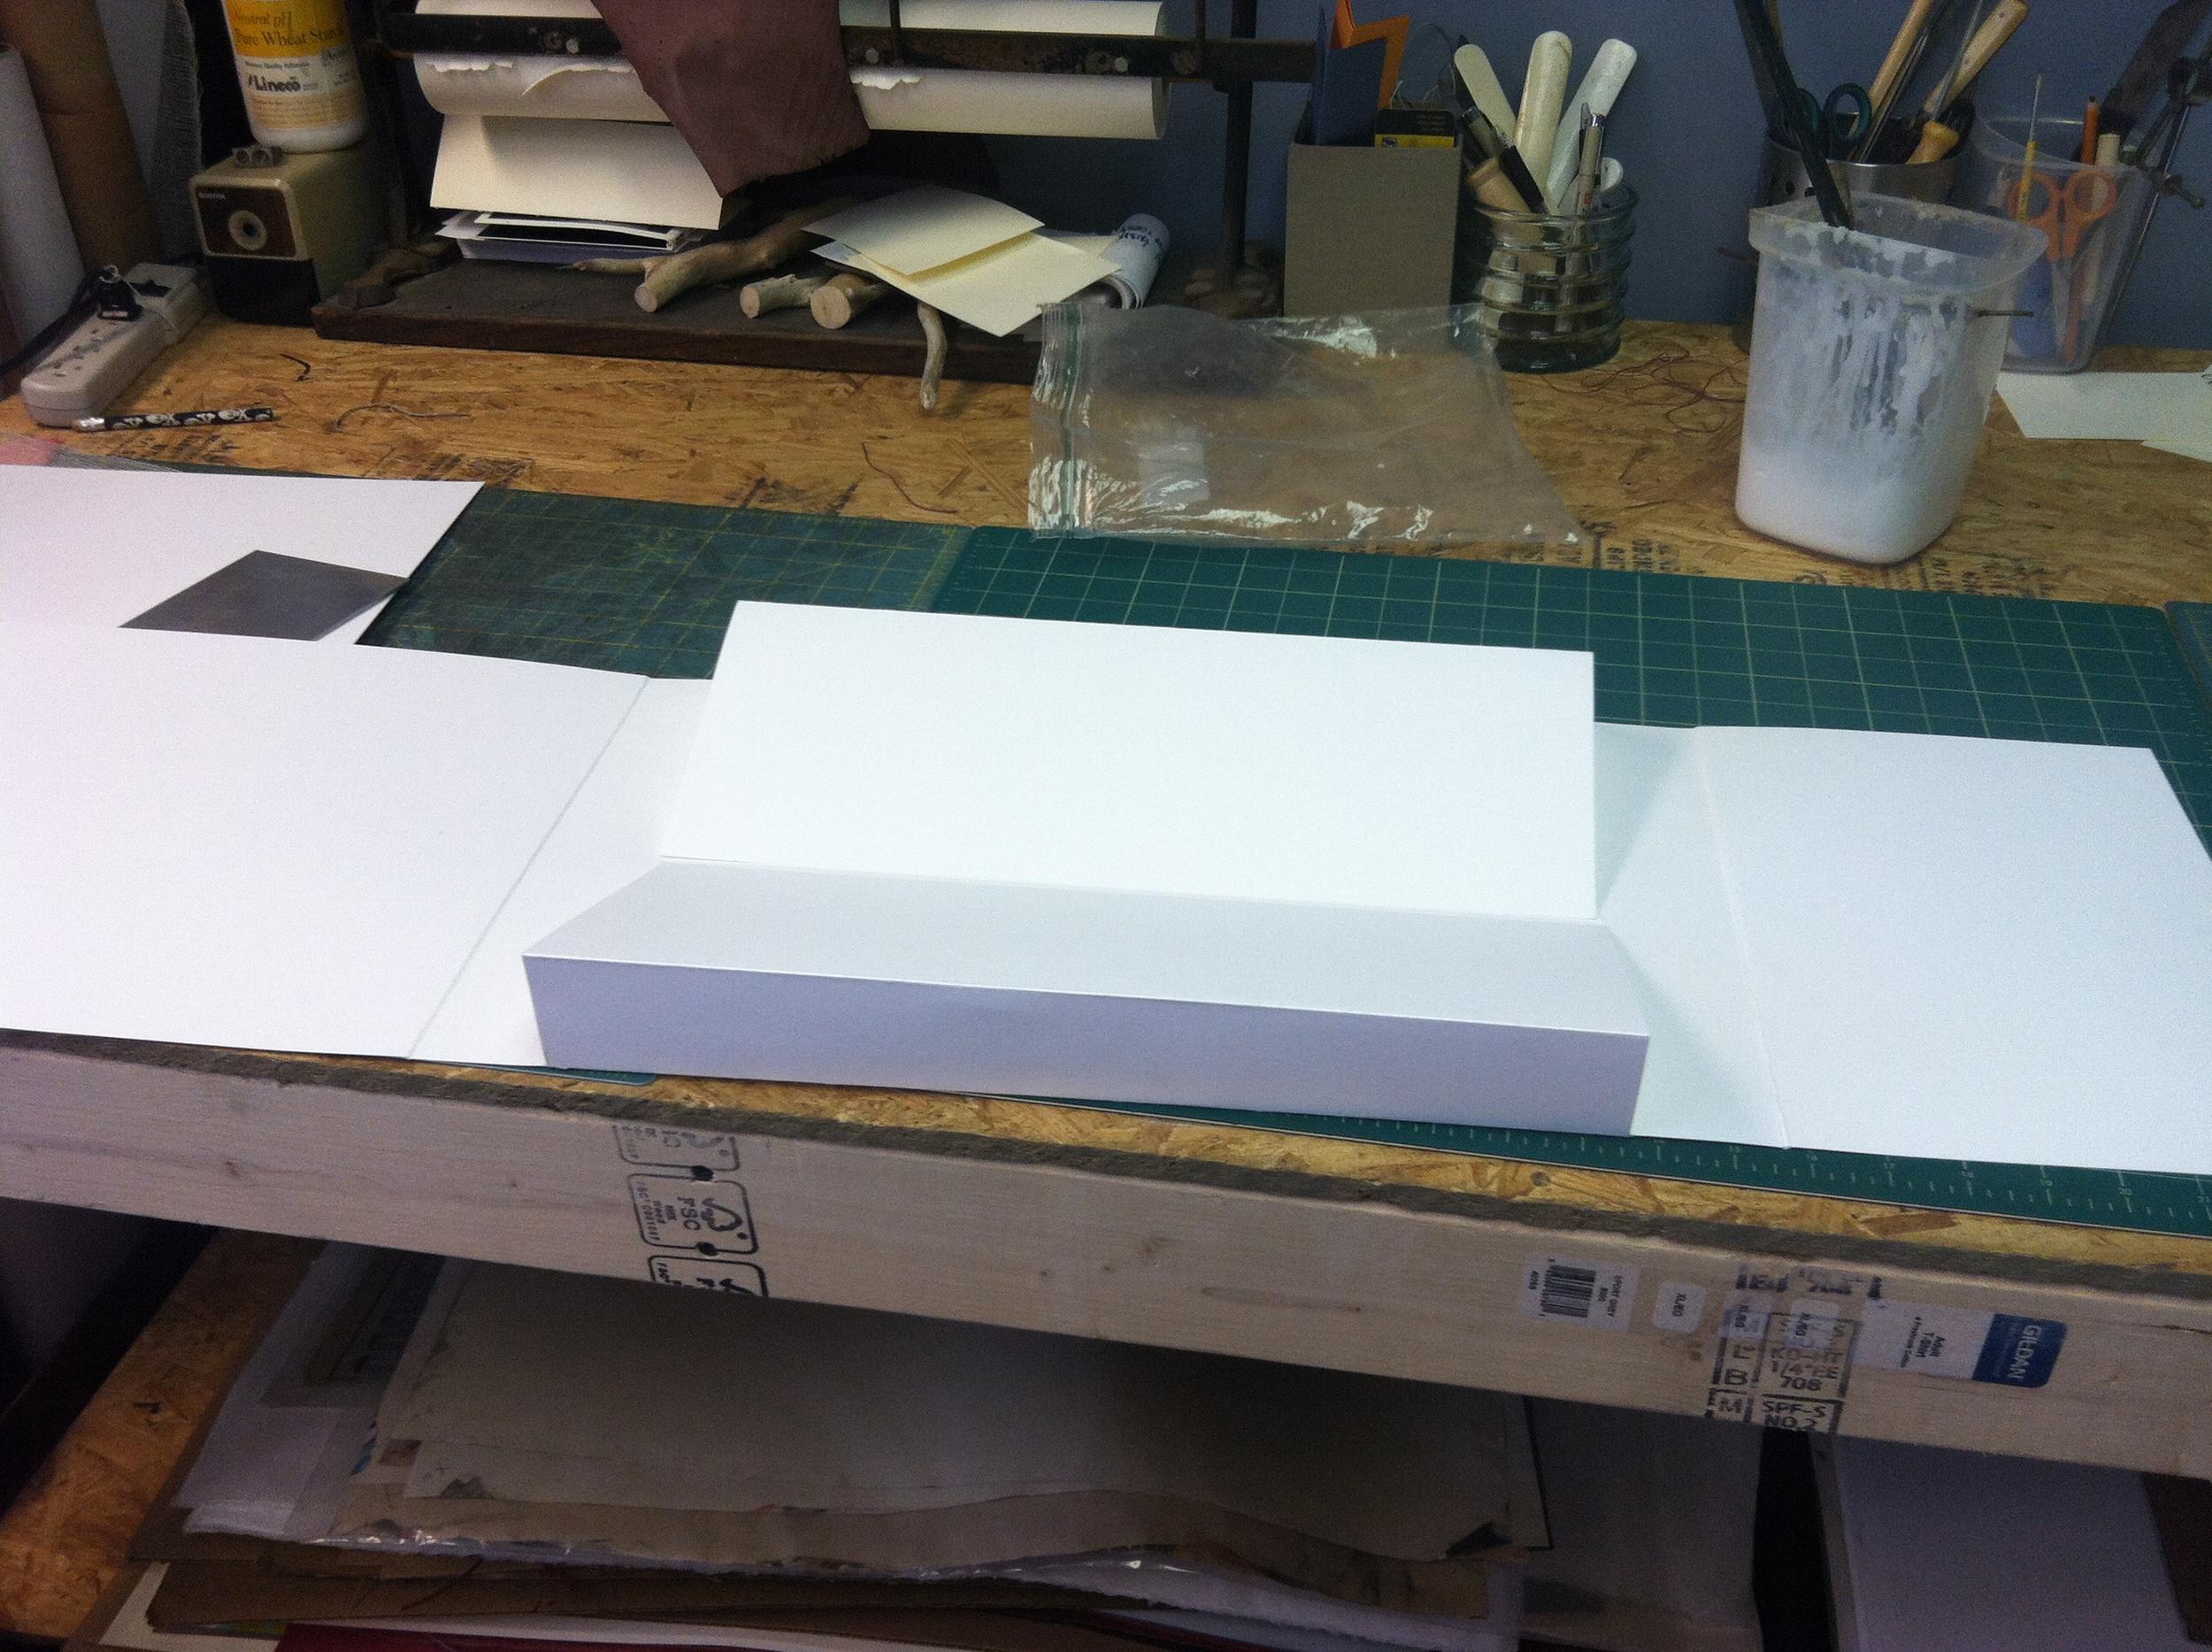 dski-design-paper-boxes-2